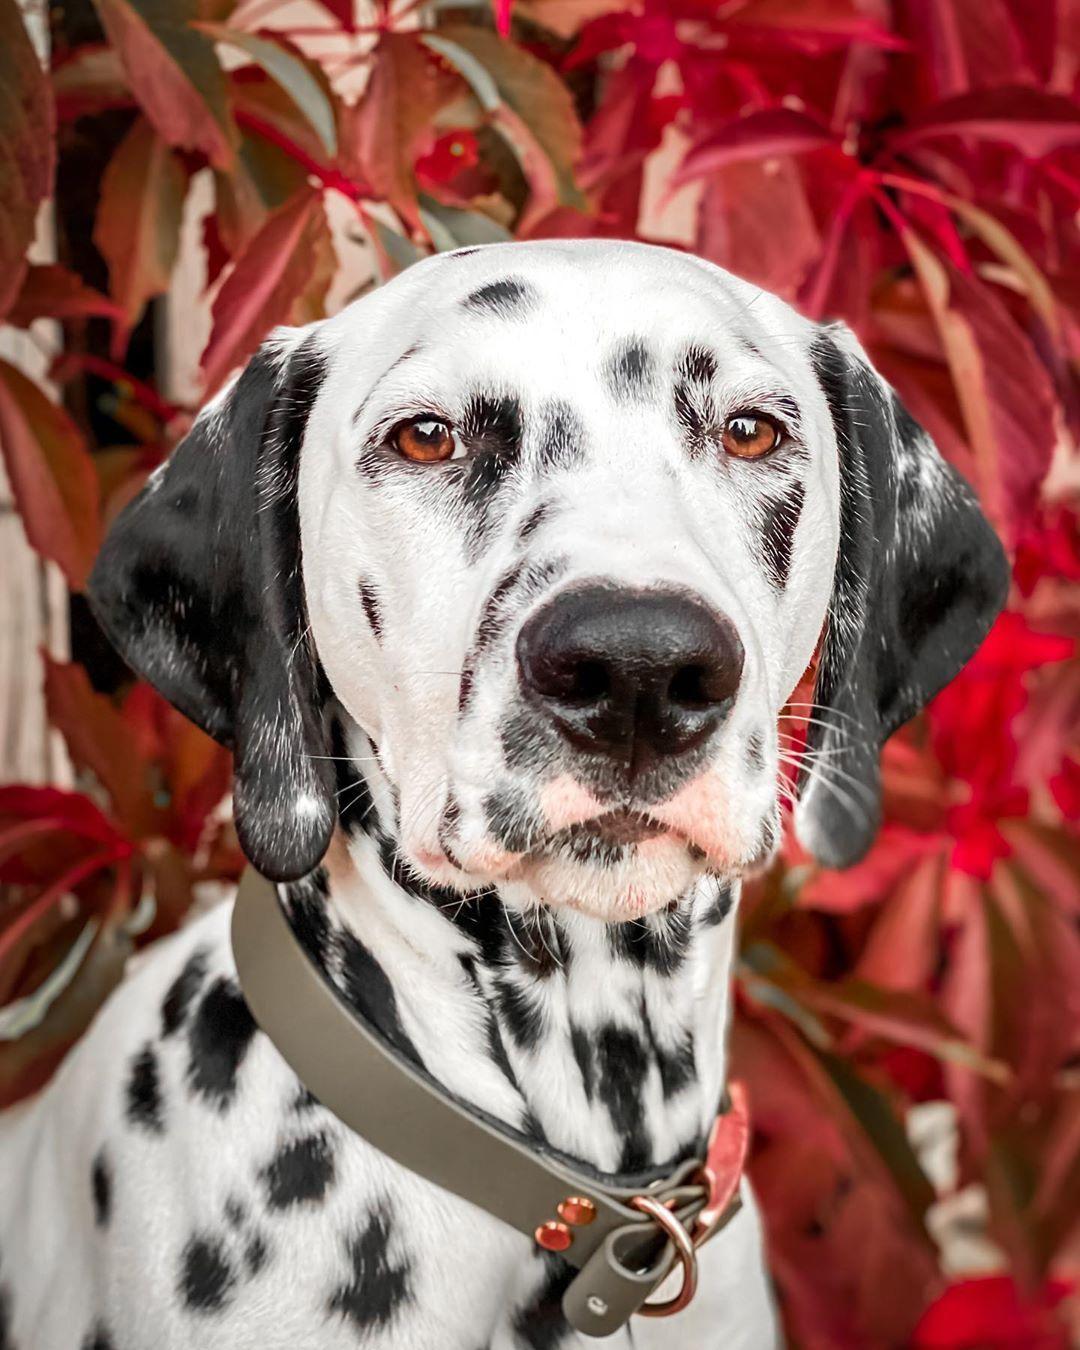 Autumn is here #hound #dogoftheday #dogsofinstagram #ilovemydog #instagramdogs #dalmatianpuppy #dalmatian #pets...